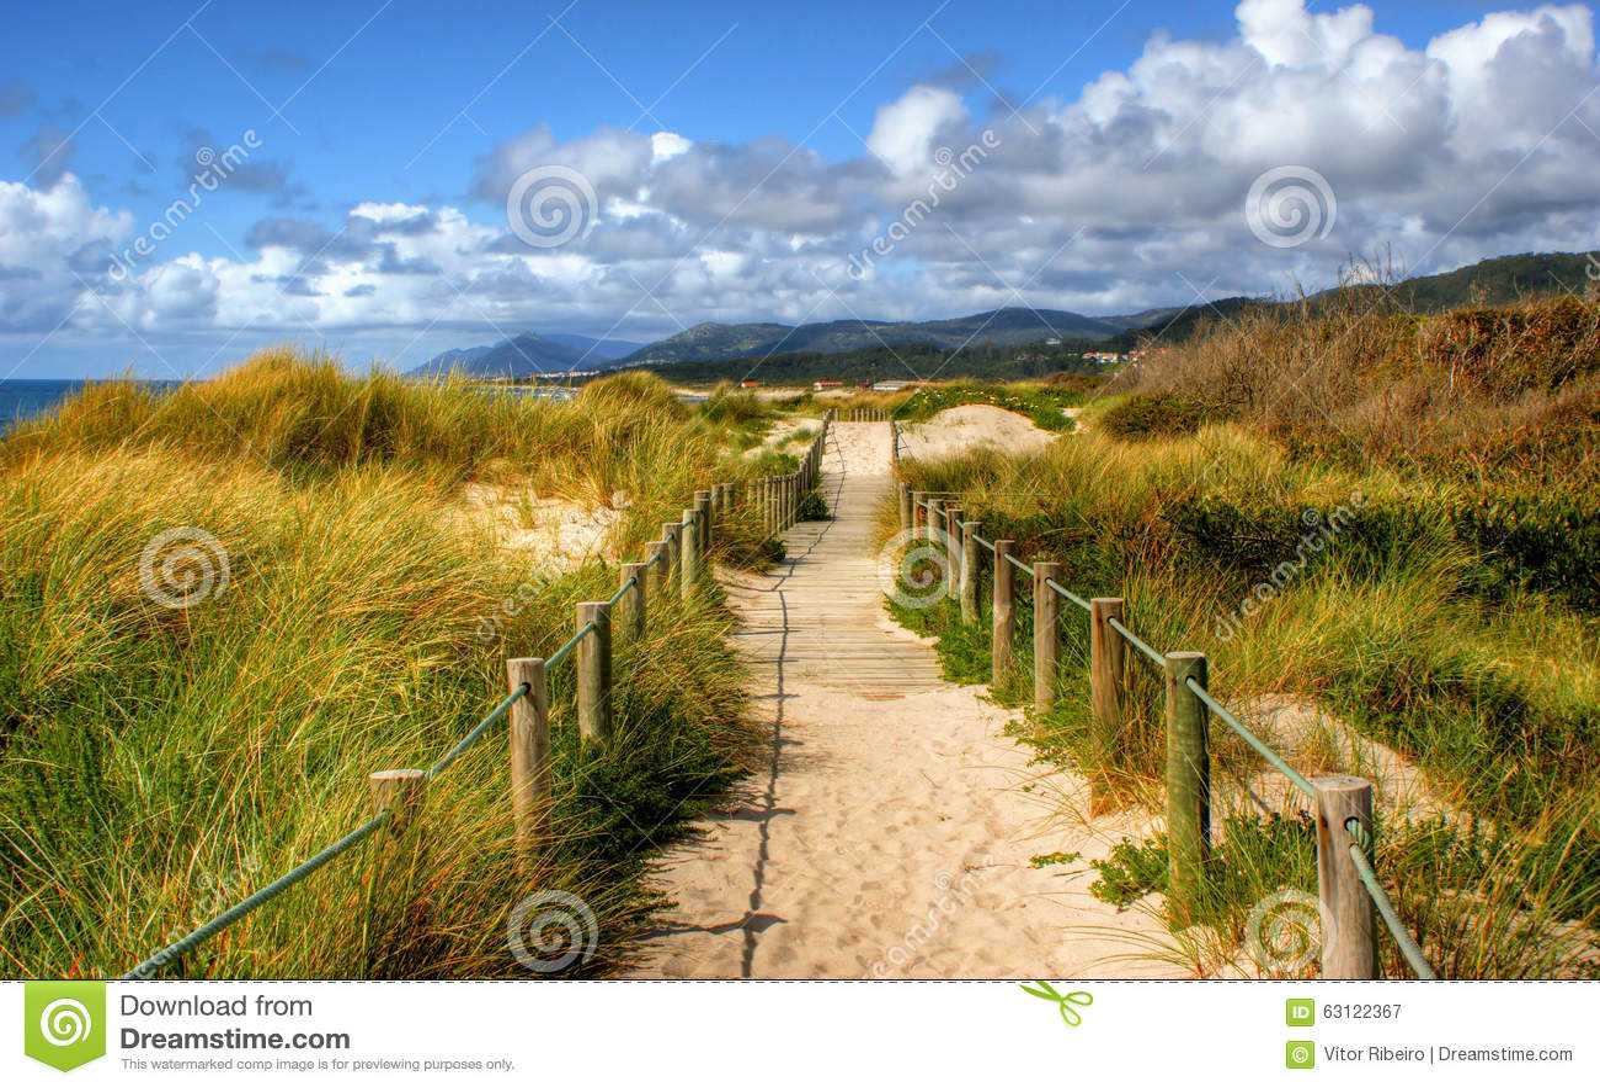 Boardwalk through the sand dunes on beach